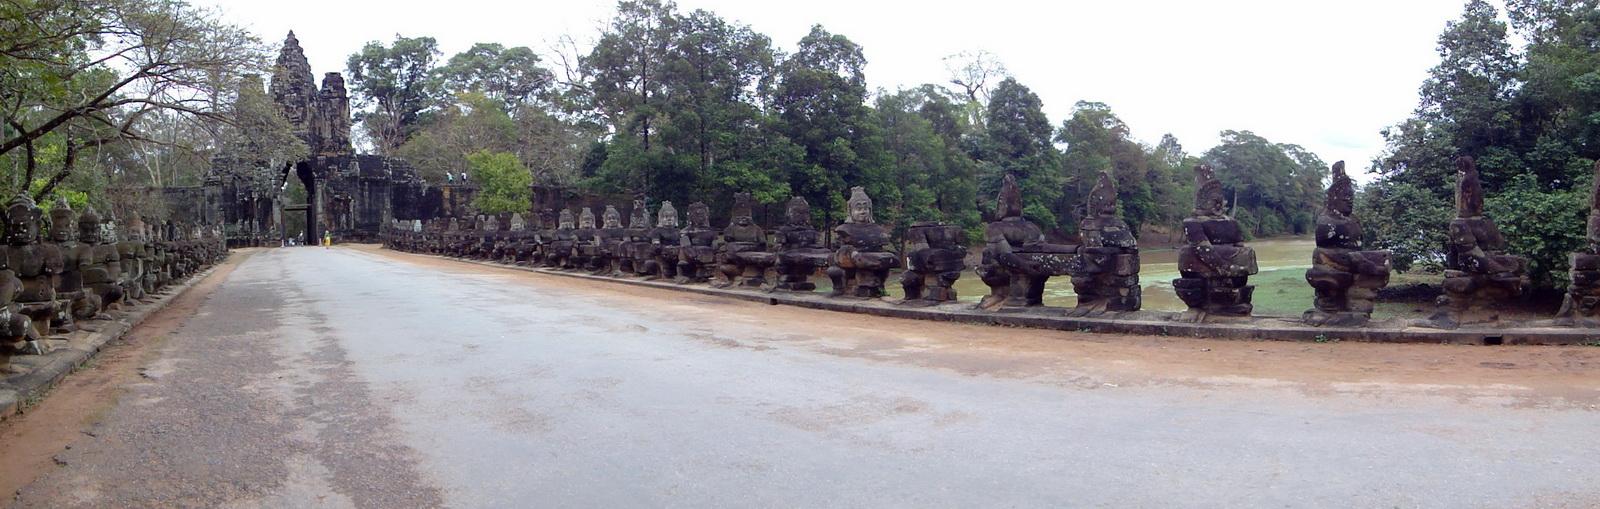 Asuras and Devas Statues on the South Gate bridge Jan 2010 01